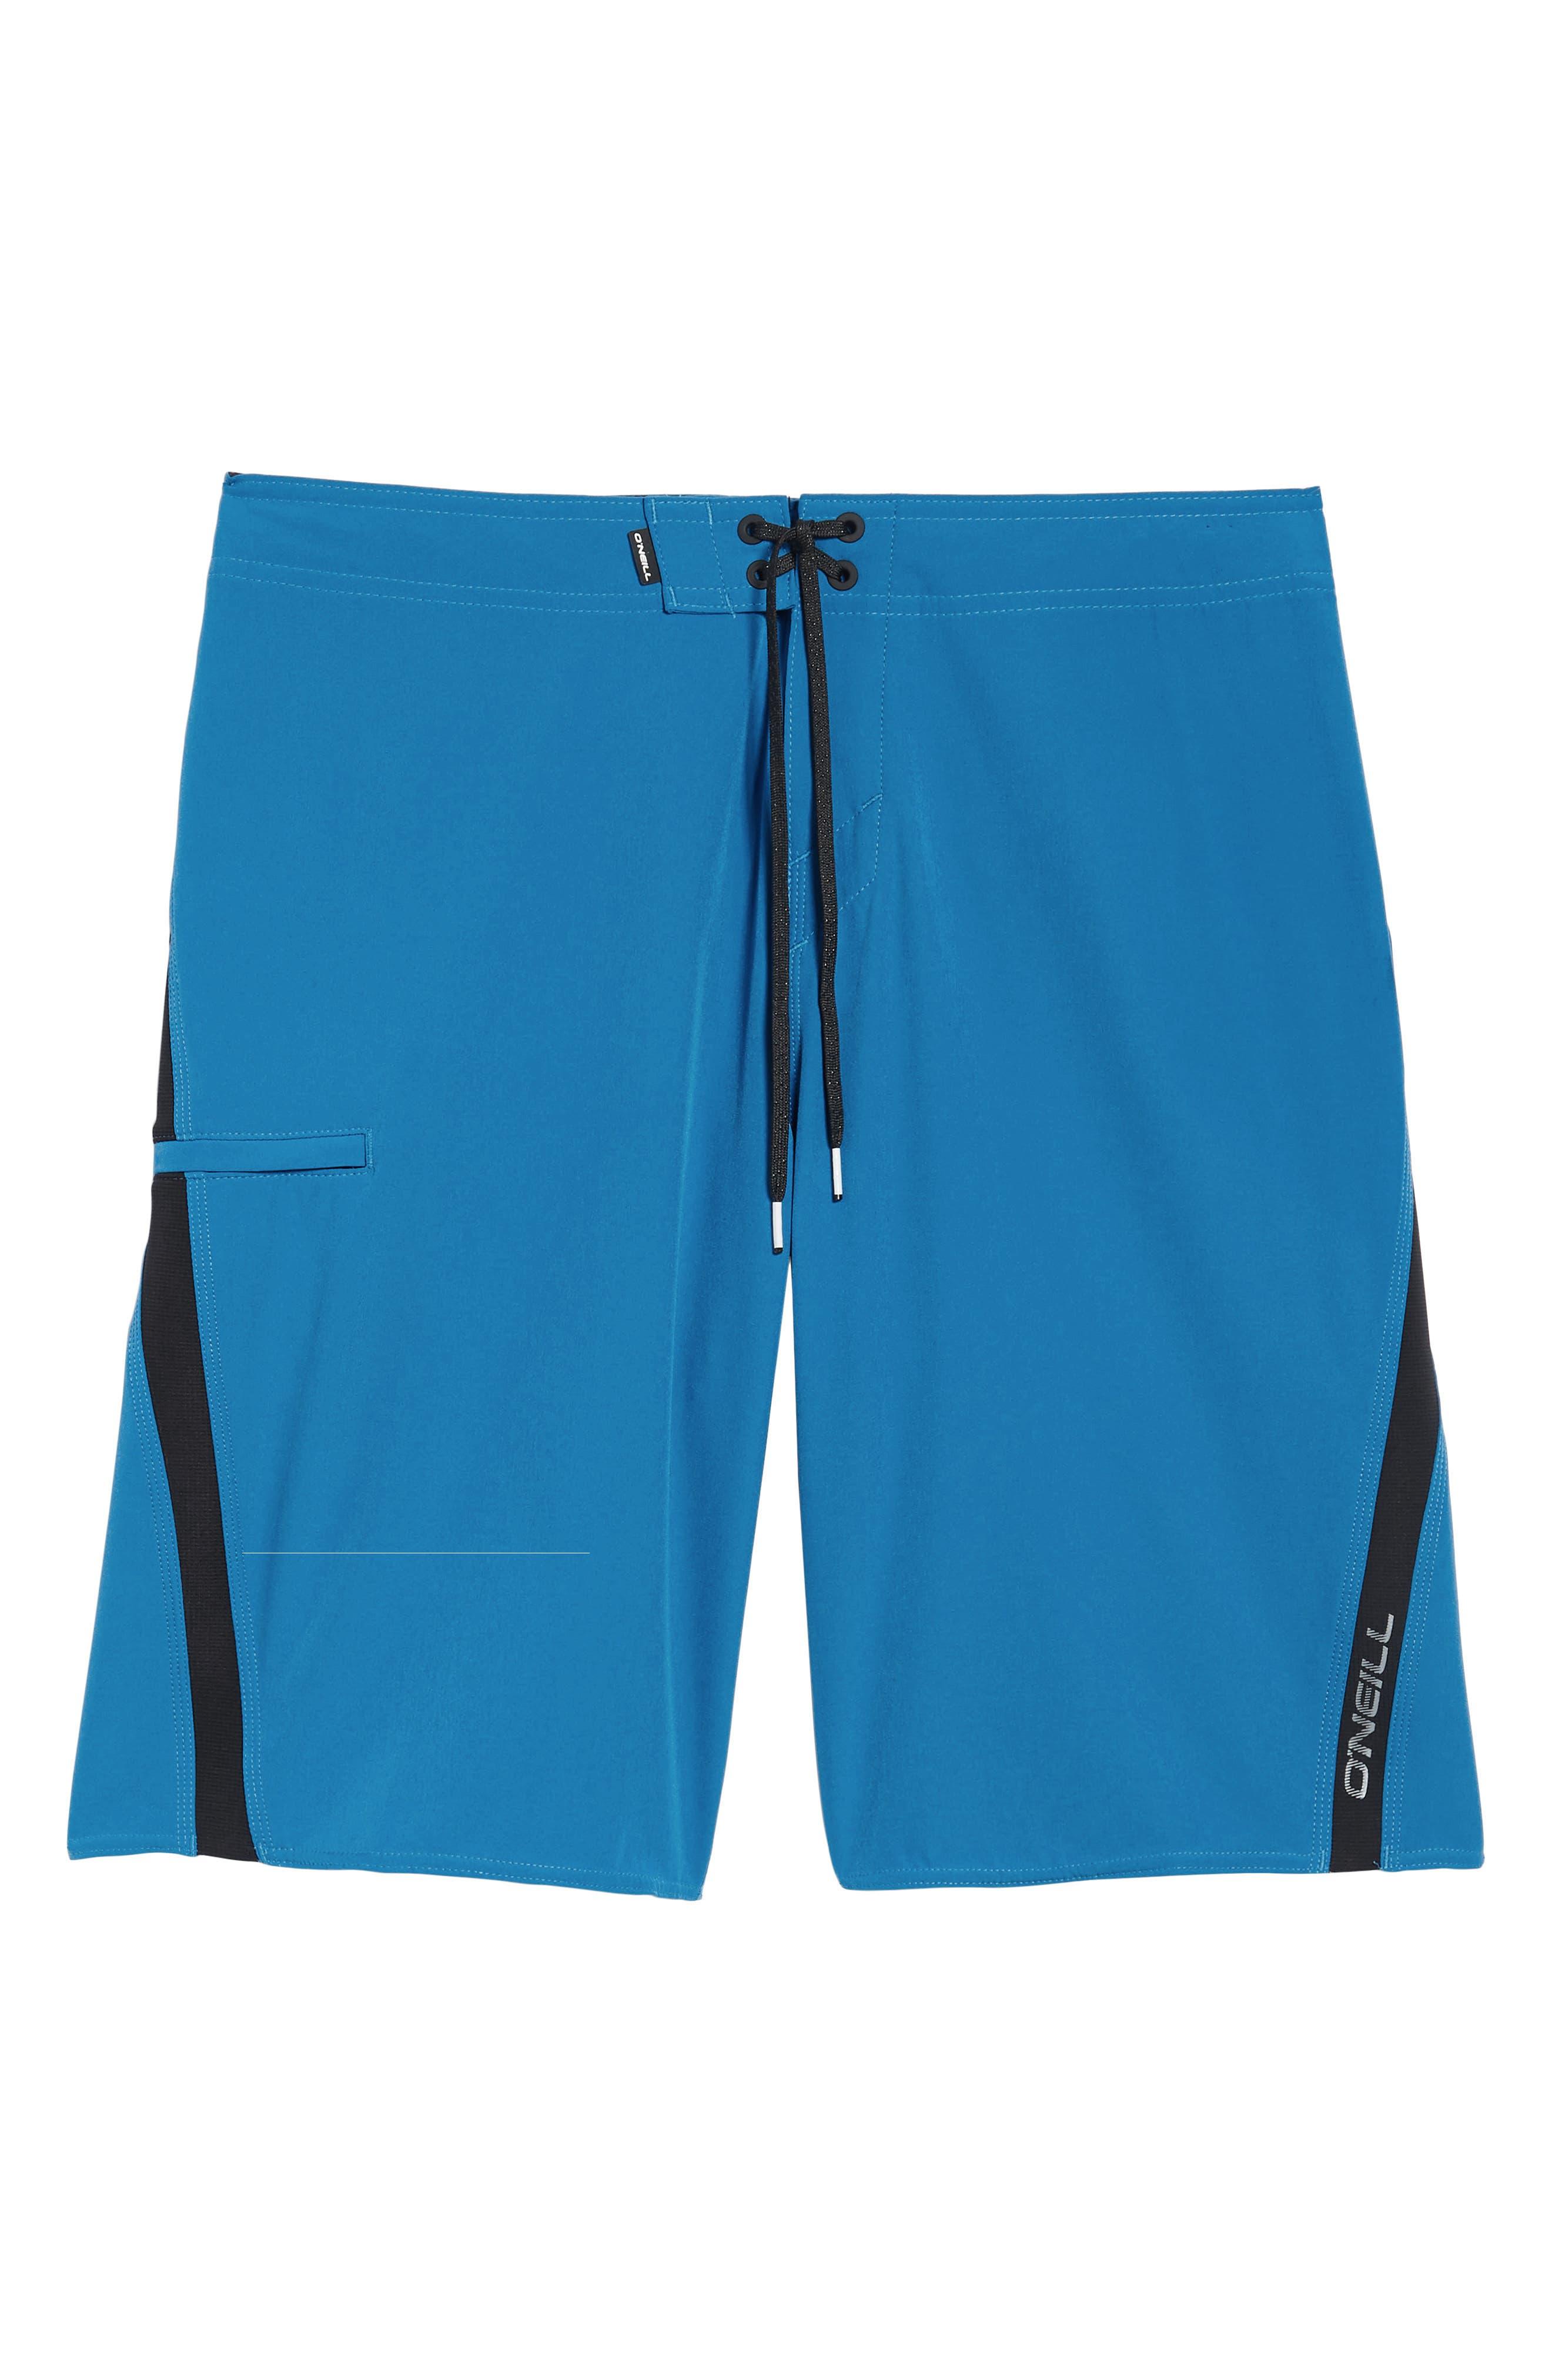 Superfreak Board Shorts,                             Alternate thumbnail 18, color,